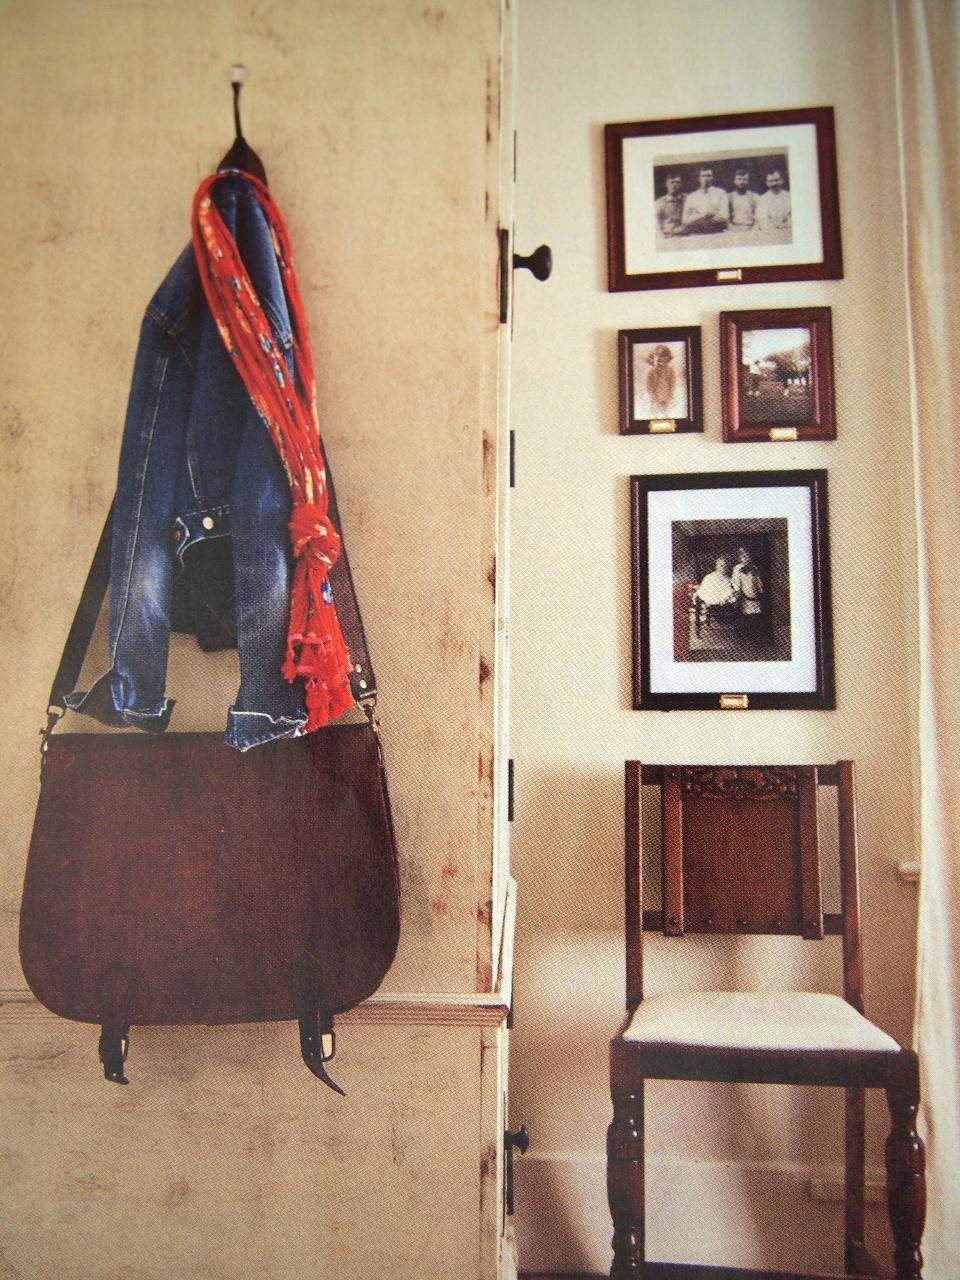 Margo S Junkin Journal Closer Look At Flea Market Style